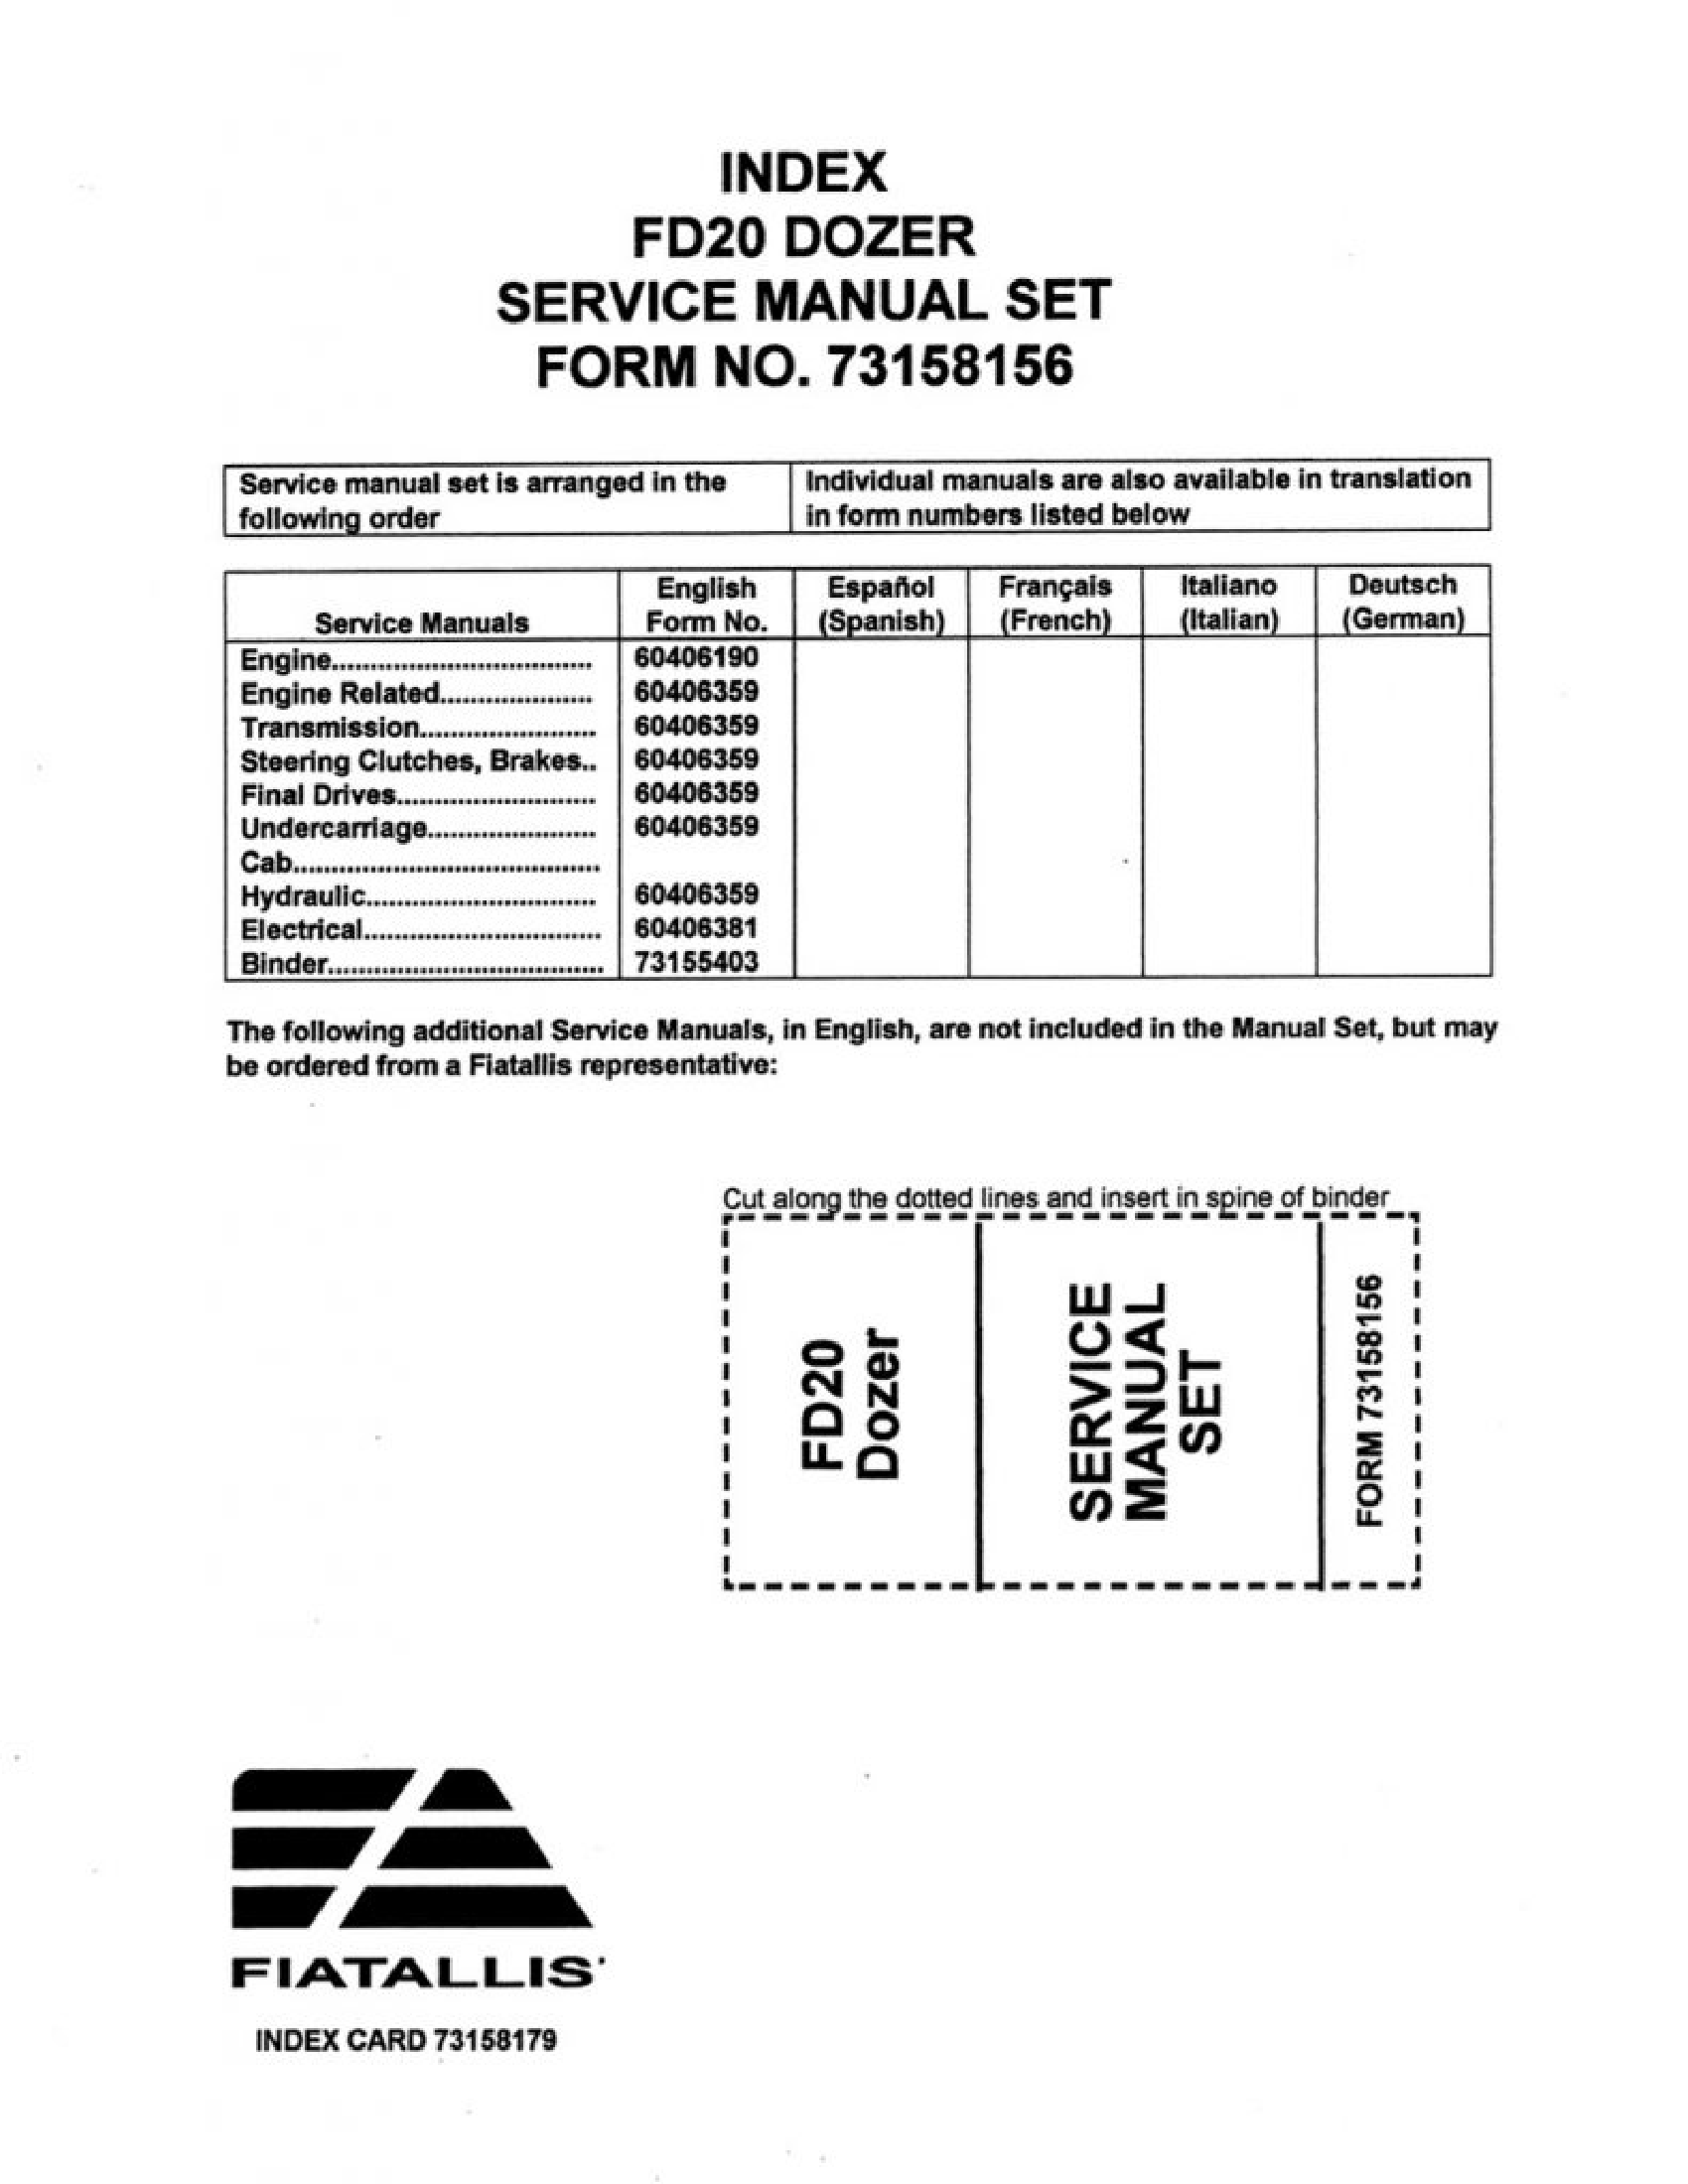 Fiat-Allis FD20 Dozer manual